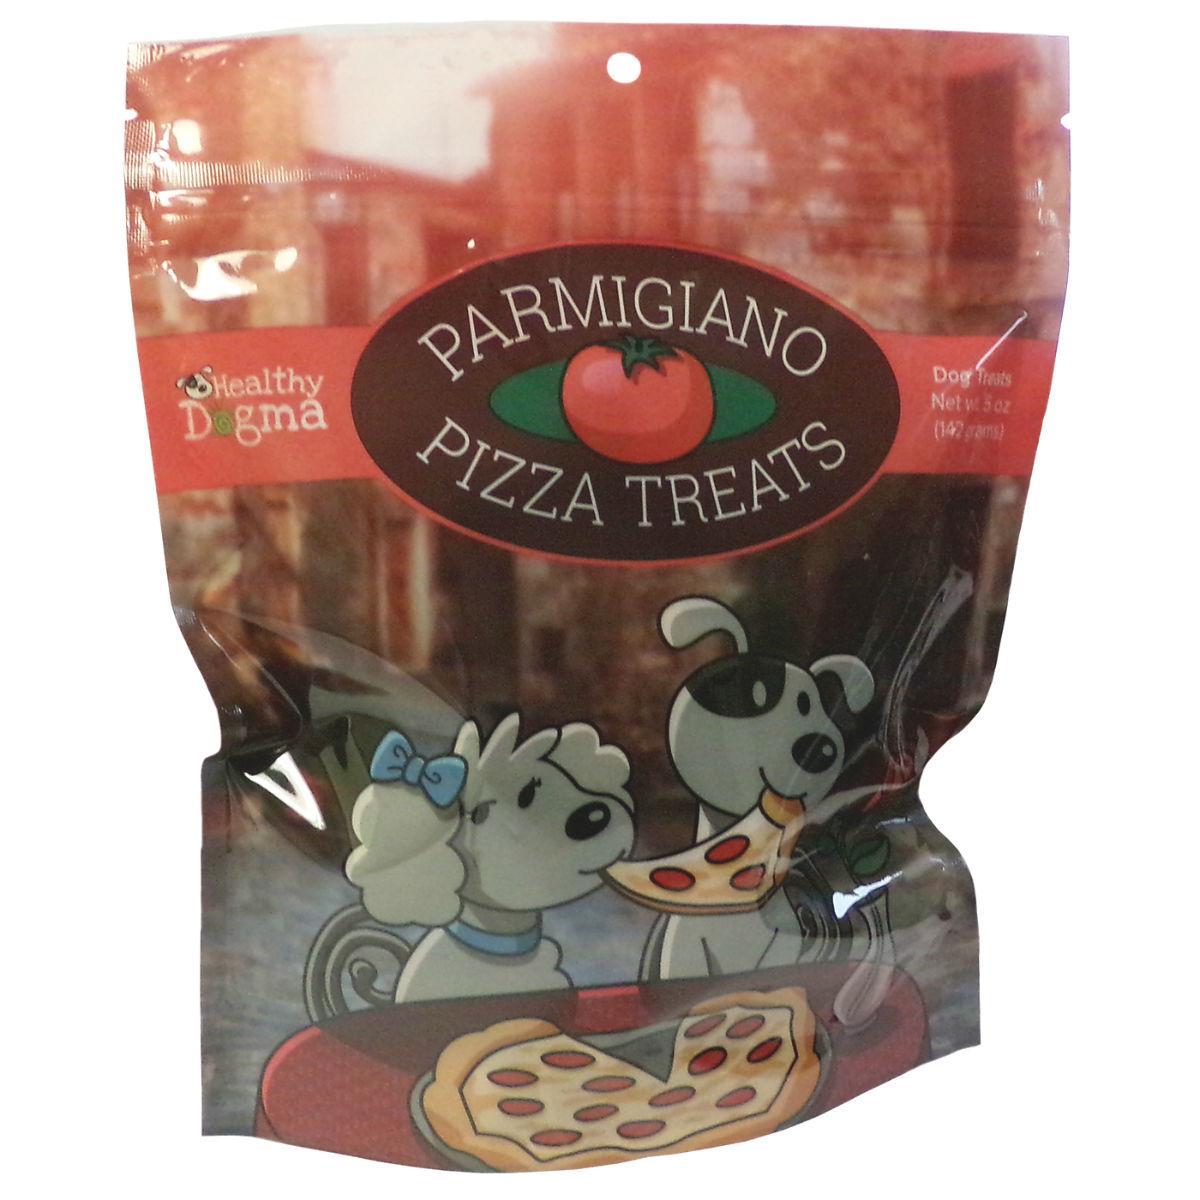 Healthy Dogma Parmigiano Pizza Dog Treat